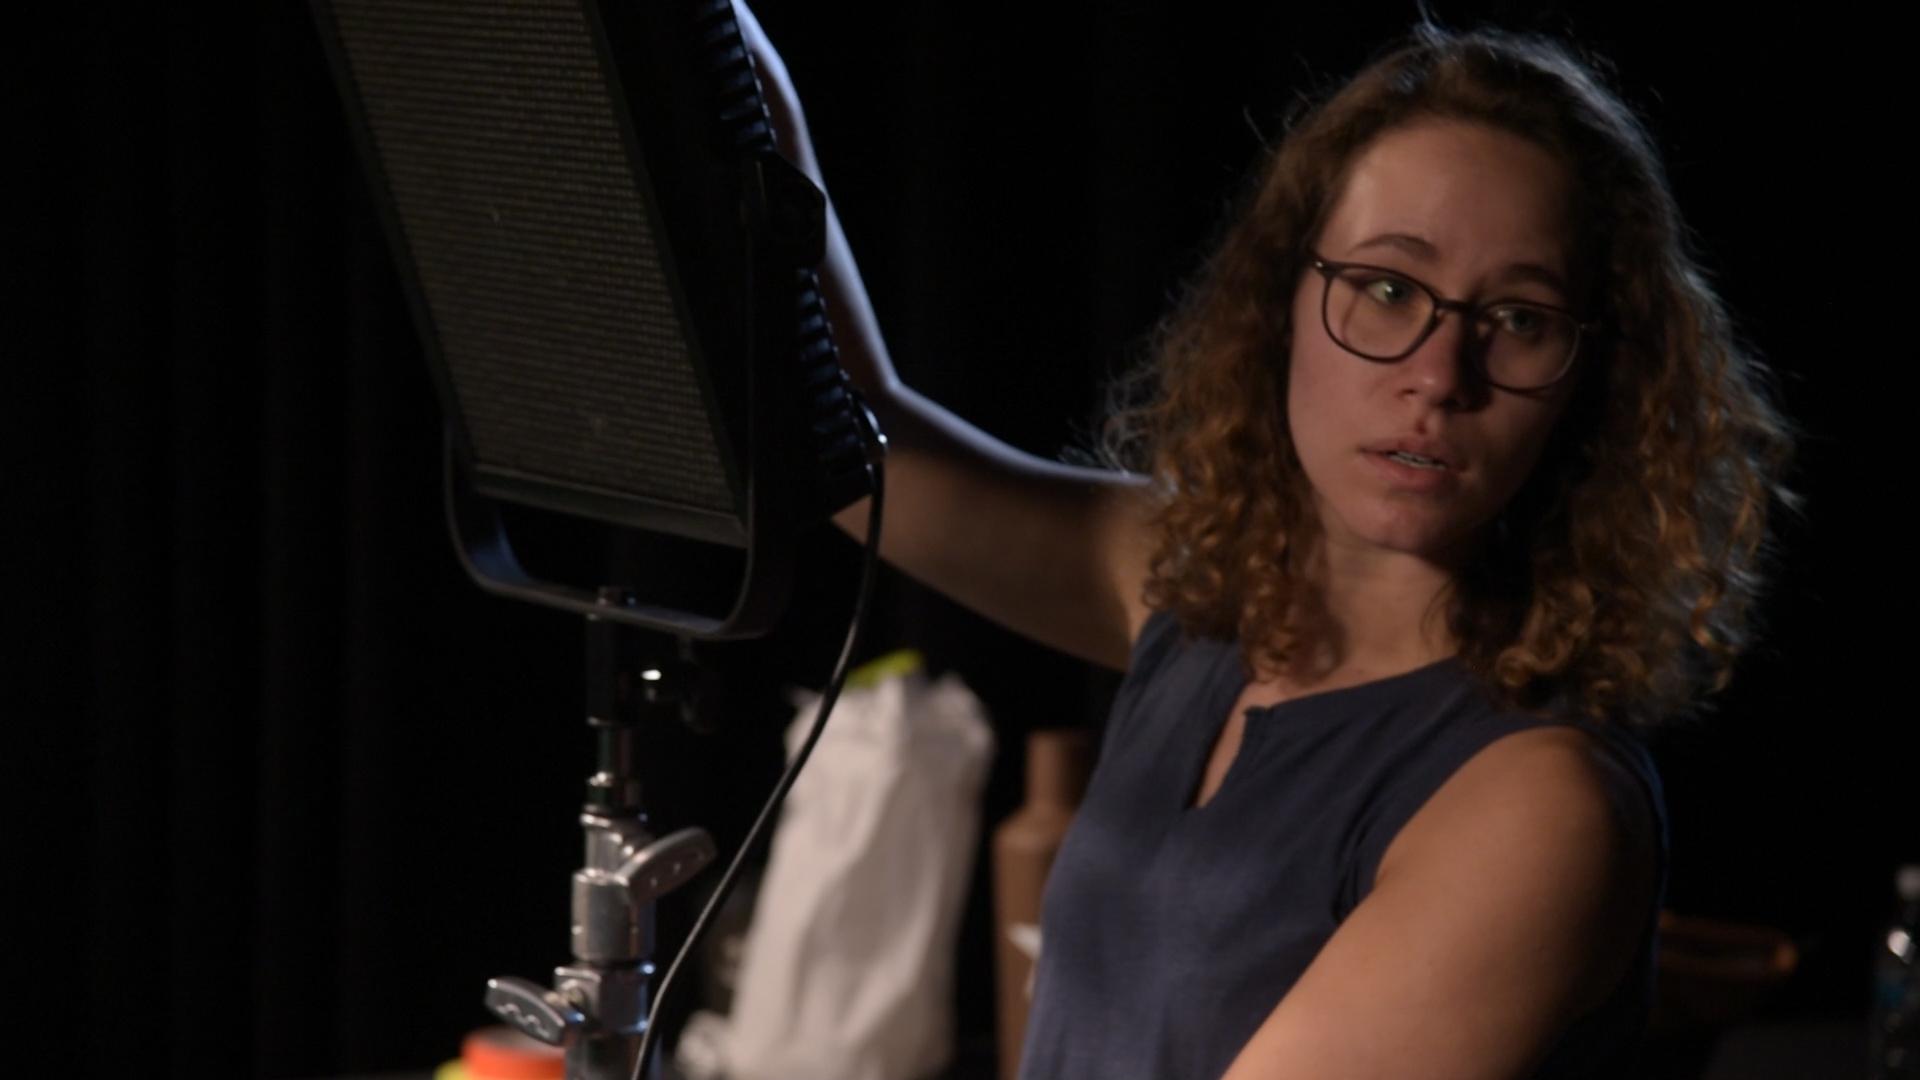 Brianna Green behind the scenes on the set of Geena Matuson's (@geenamatuson) film shoot, 2019. Cinematography by Matthew DeVirgilio. See more @ geenamatuson.com.